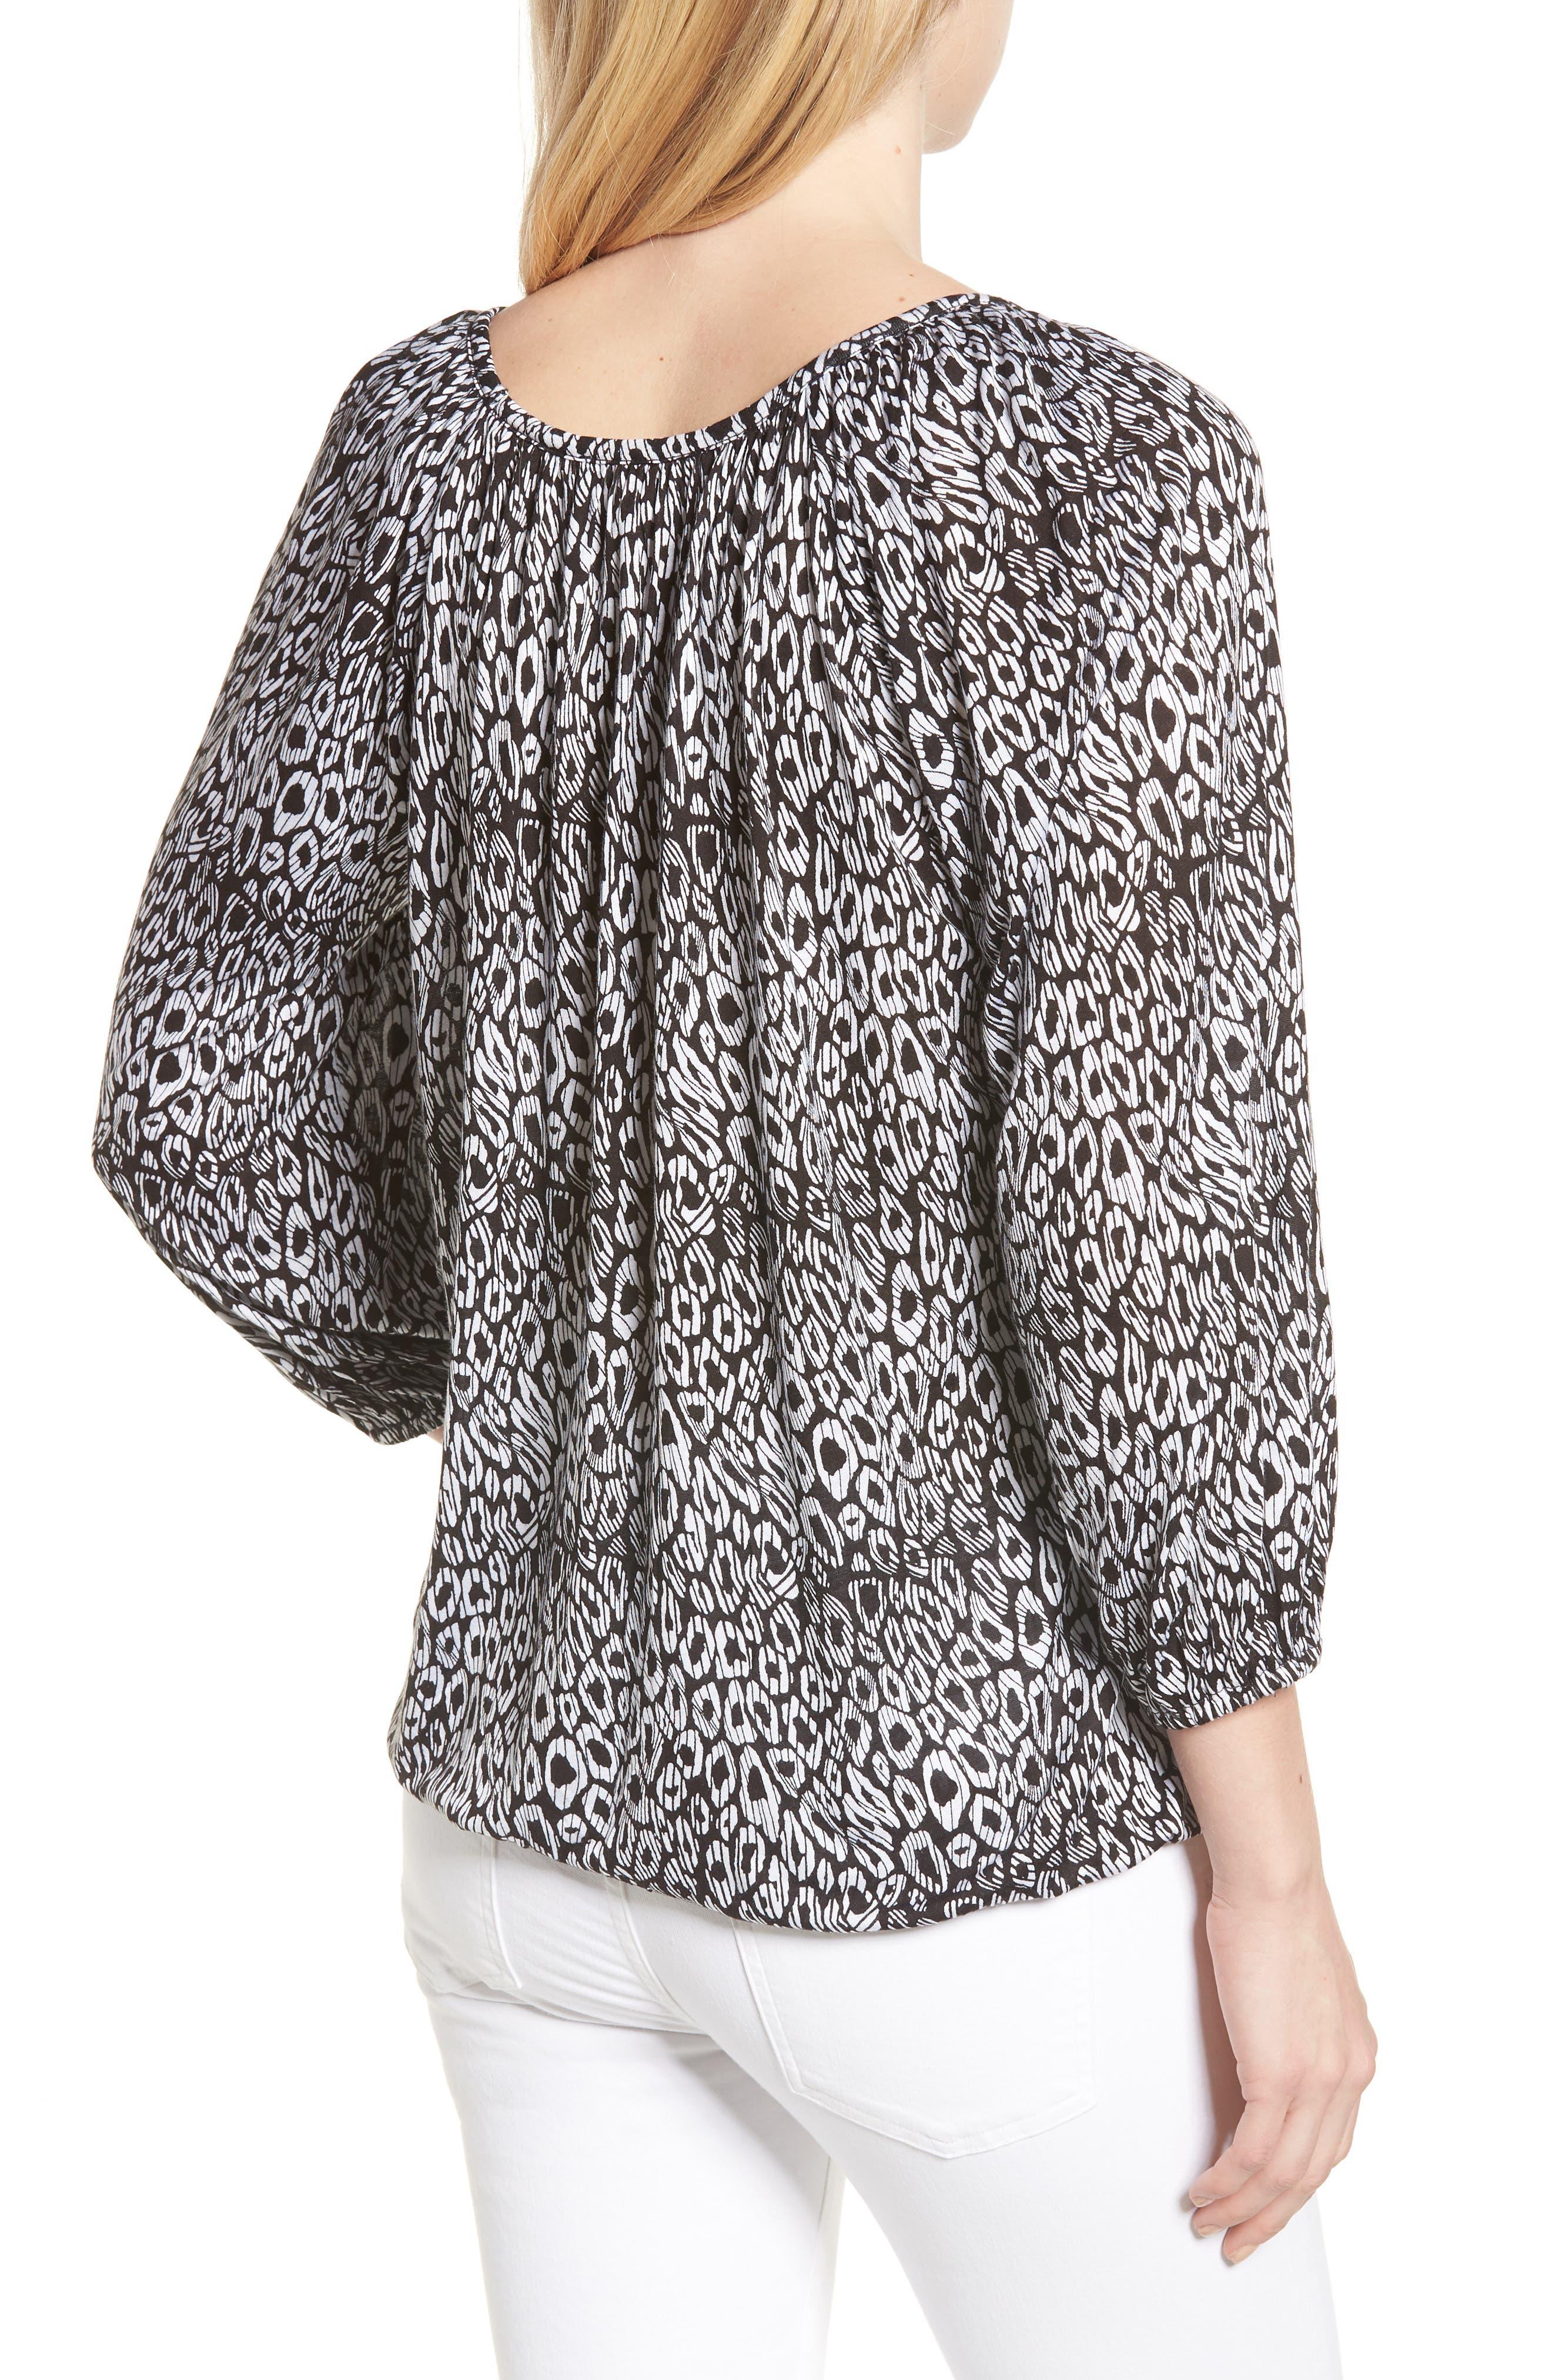 Wavy Leopard Stripe Peasant Top,                             Alternate thumbnail 2, color,                             Black/ White